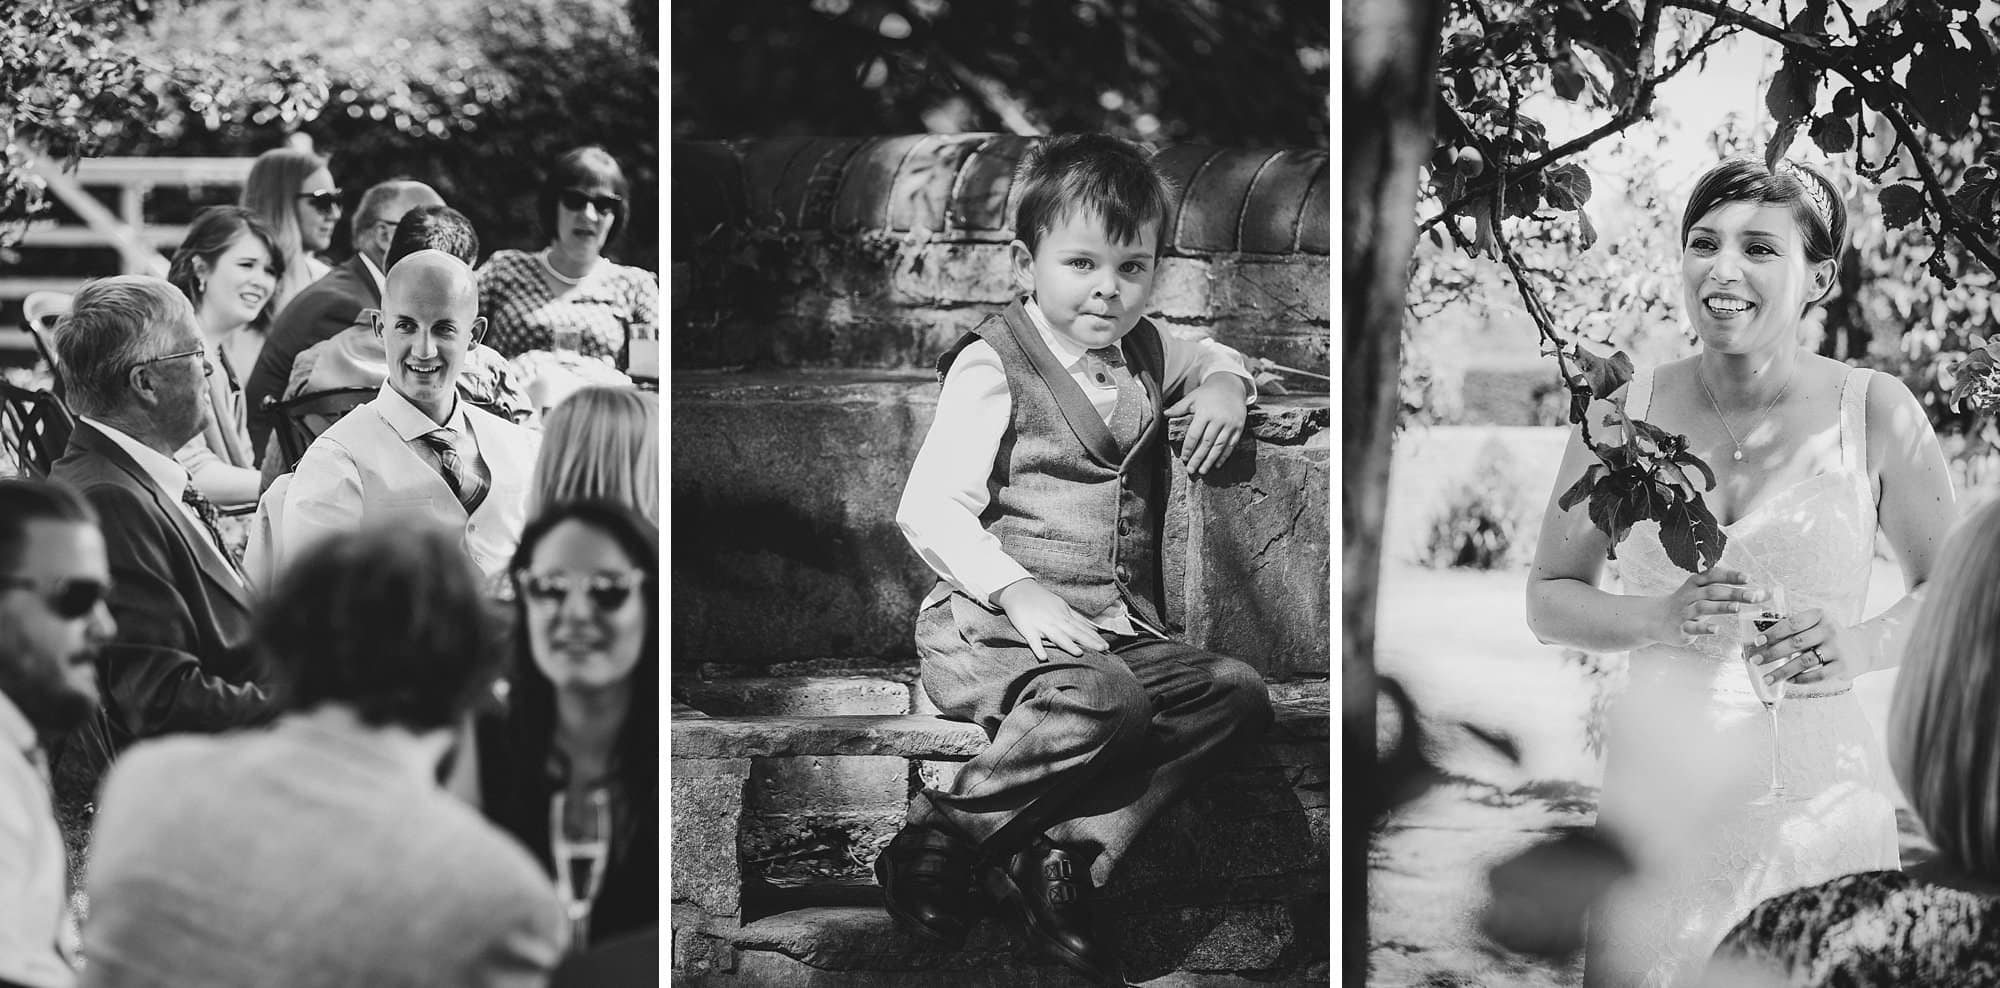 oaks farm wedding photographer cj 066 - Cat + Jake   Oaks Farm Wedding Photography